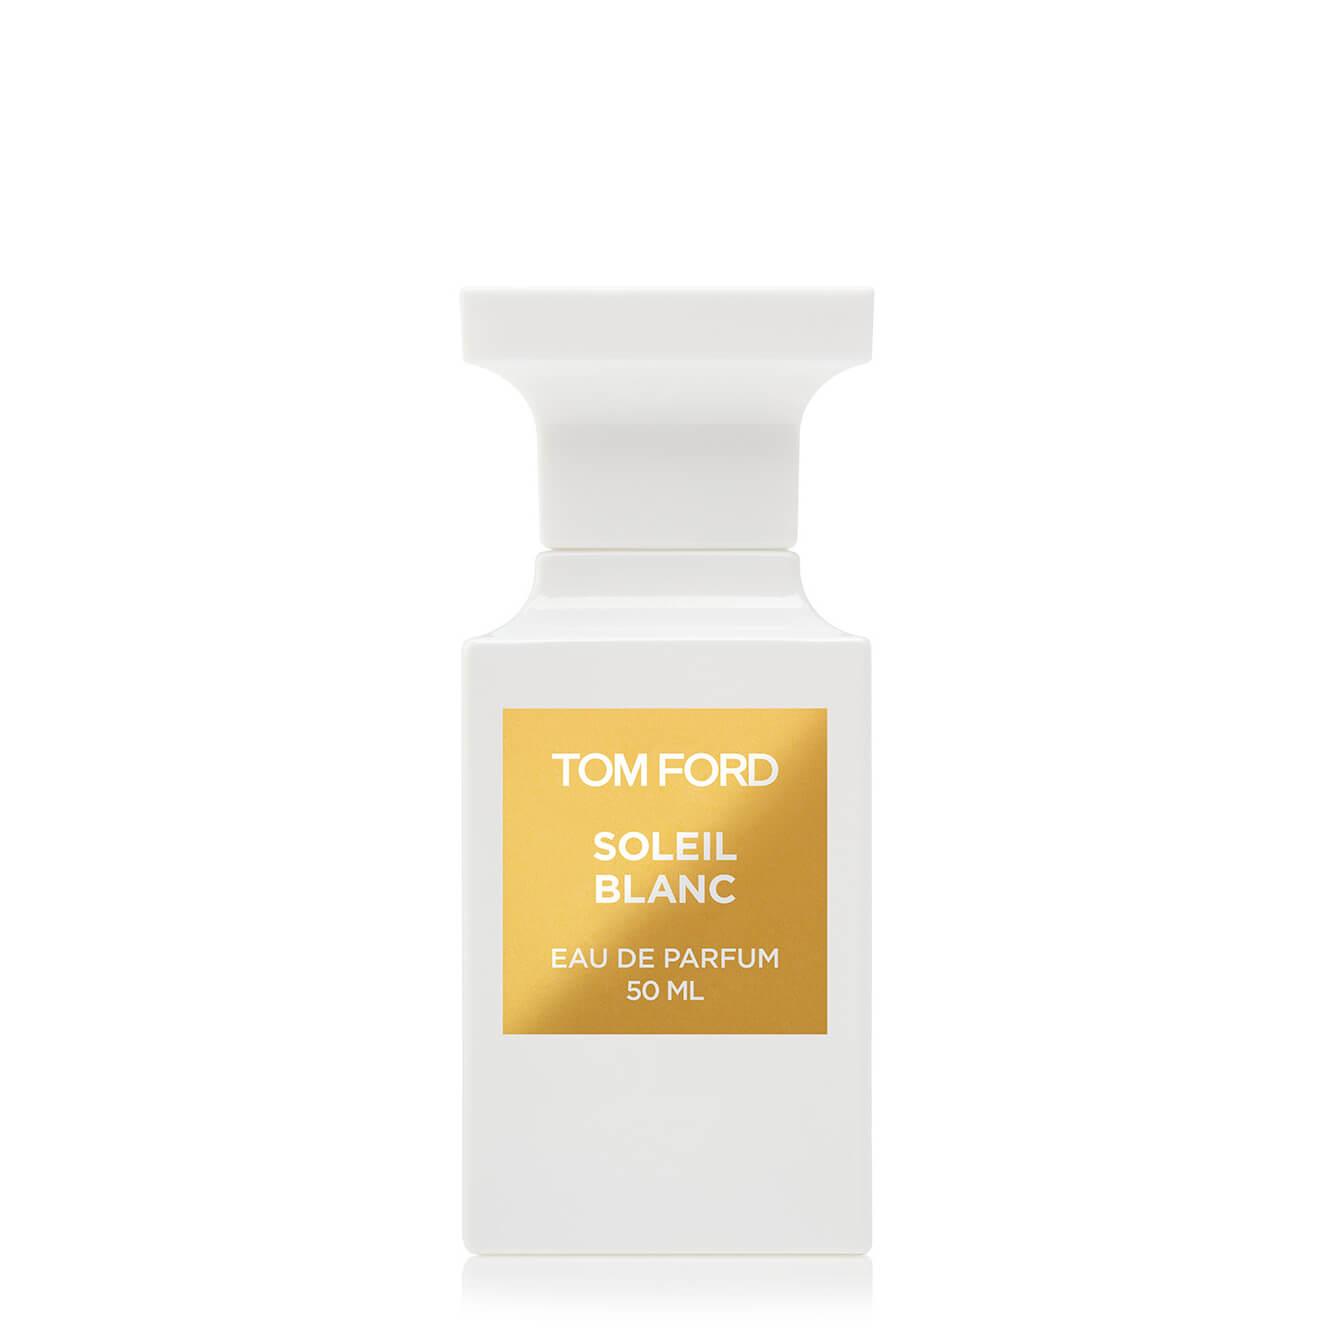 Tom Ford Soleil Blanc -- Eau de Parfum Spray (Various Sizes) - 50ML